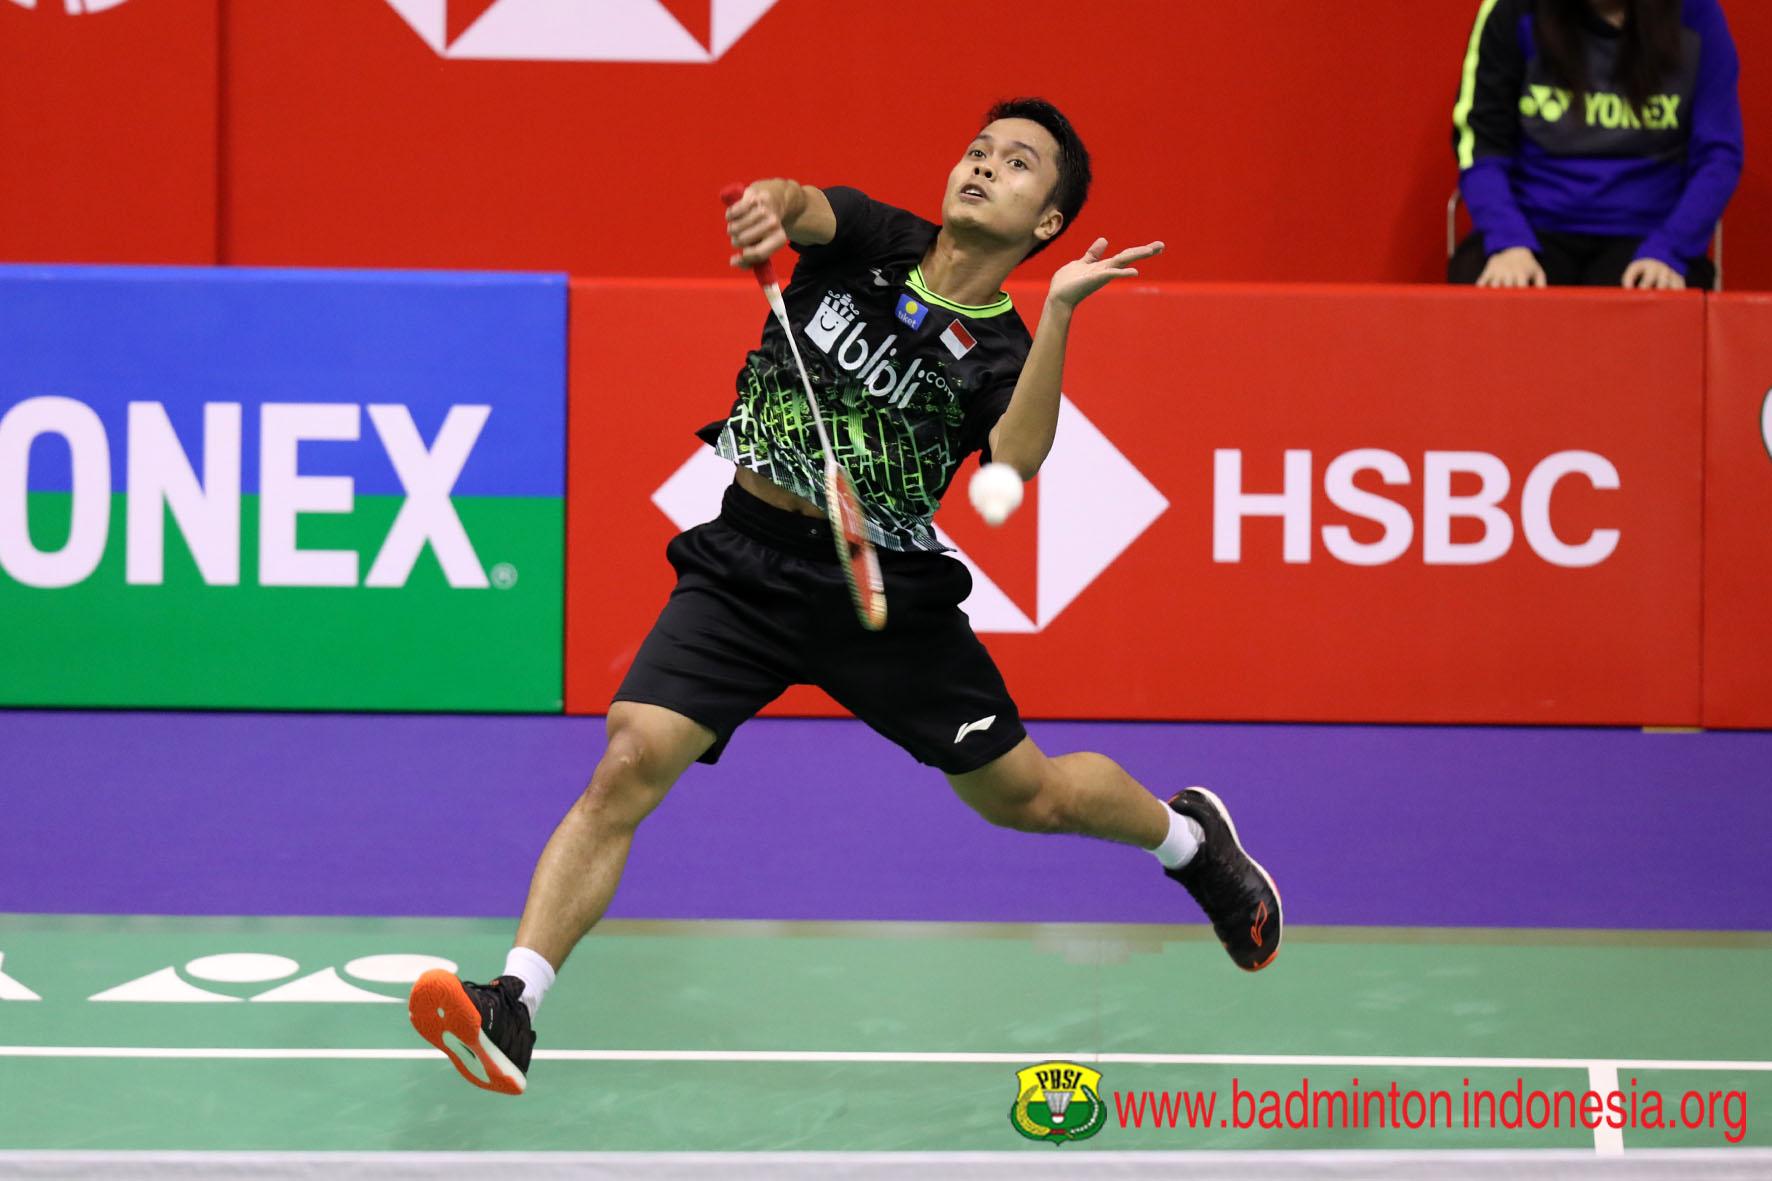 https: img.okezone.com content 2019 11 17 40 2130845 jadwal-wakil-indonesia-di-final-hong-kong-open-2019-YsyJzXfvK0.jpg